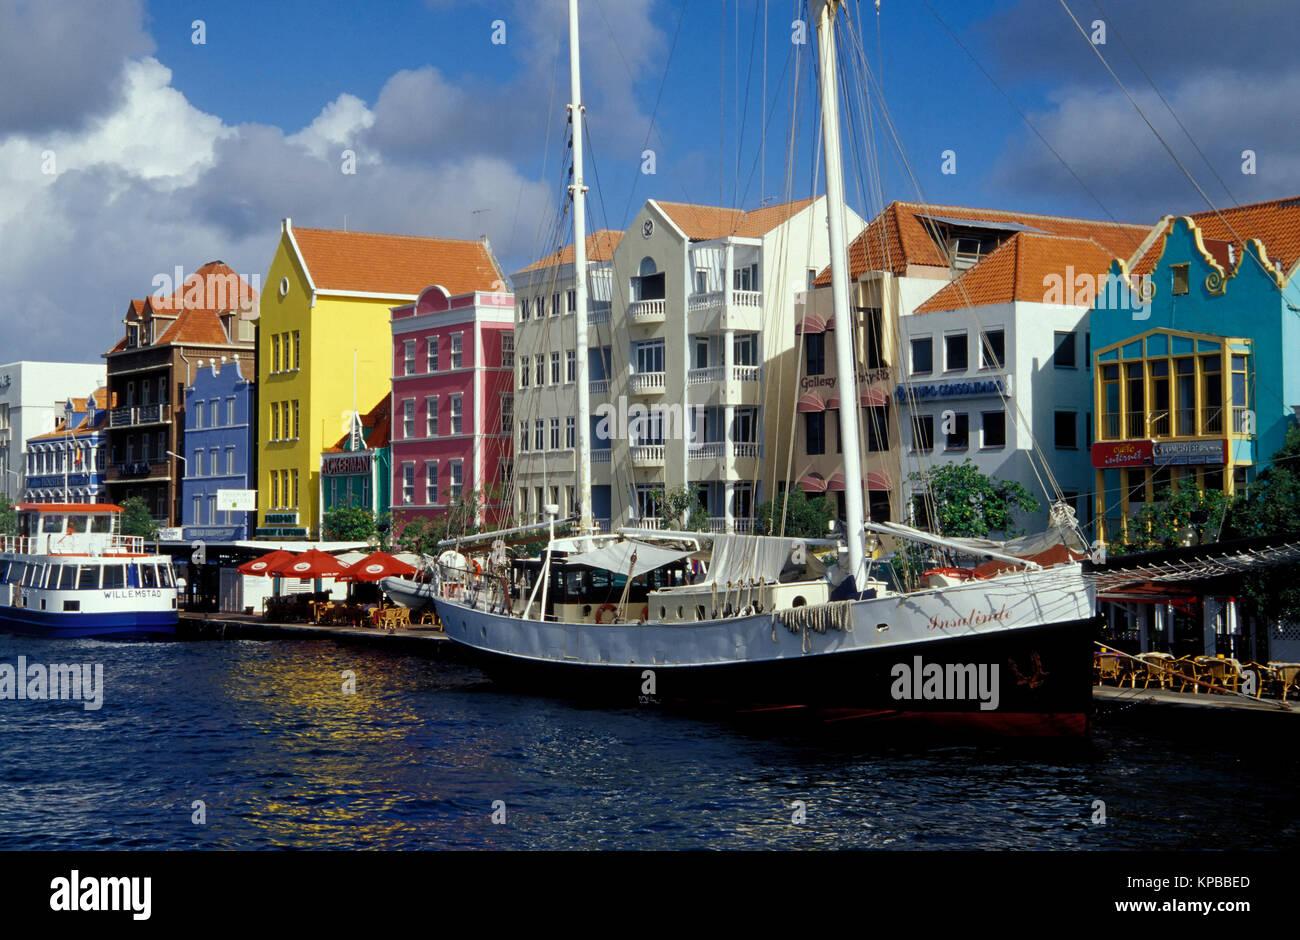 Willemstad, maisons à Handelskade, Curacao, Antilles néerlandaises Banque D'Images